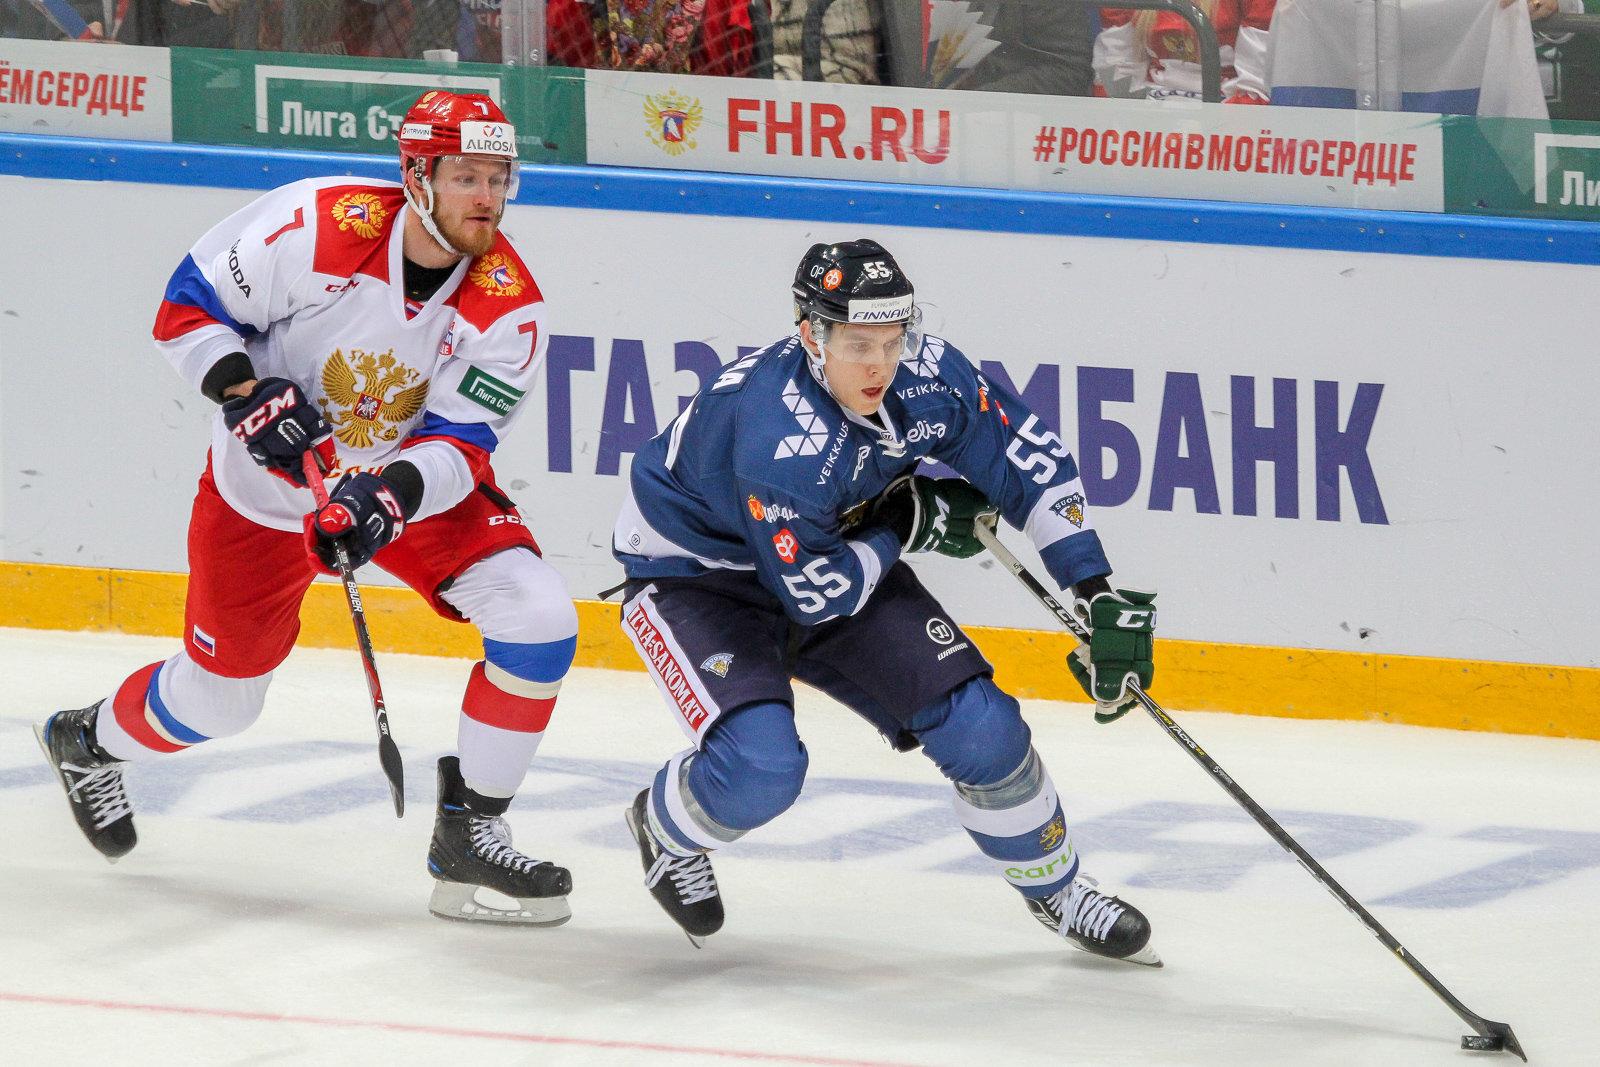 Ставки на матч Россия – Финляндия, Чемпионат мира по хоккею 2018